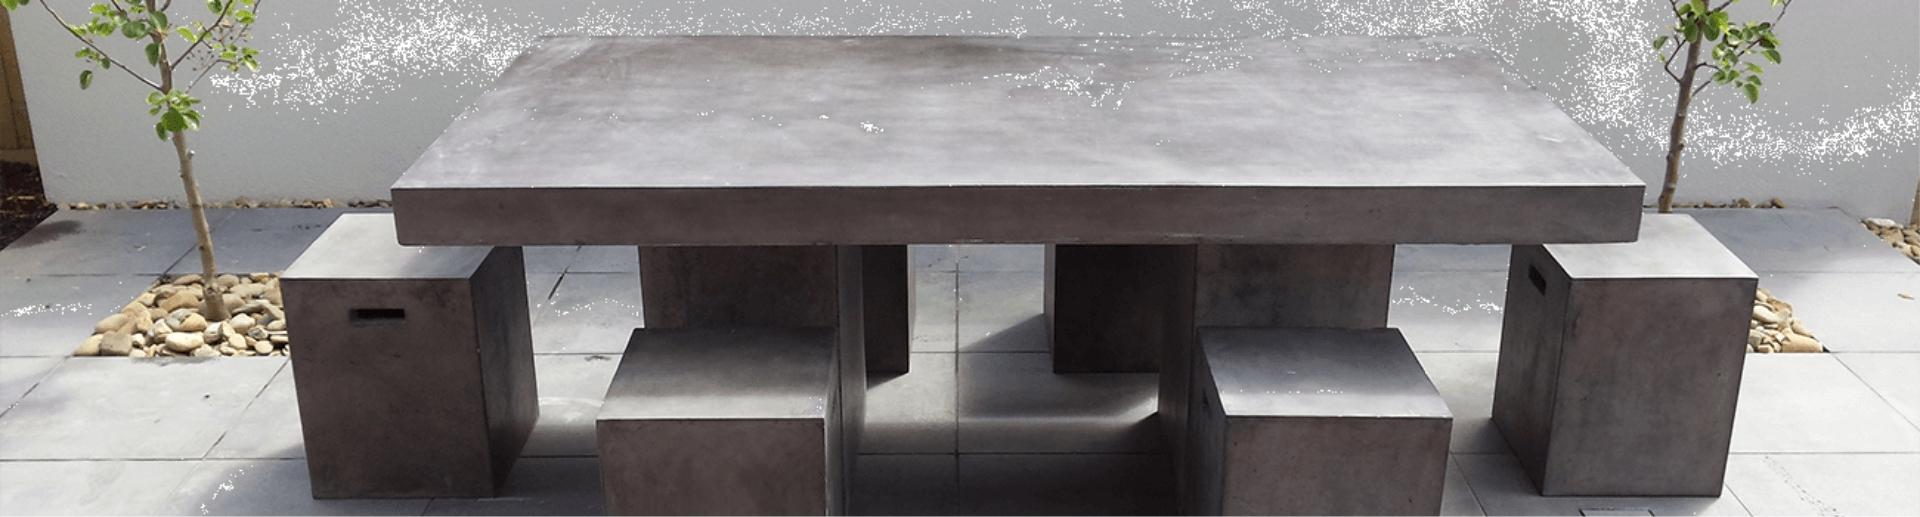 Garden Pots And Concrete Furniture In Melbourne